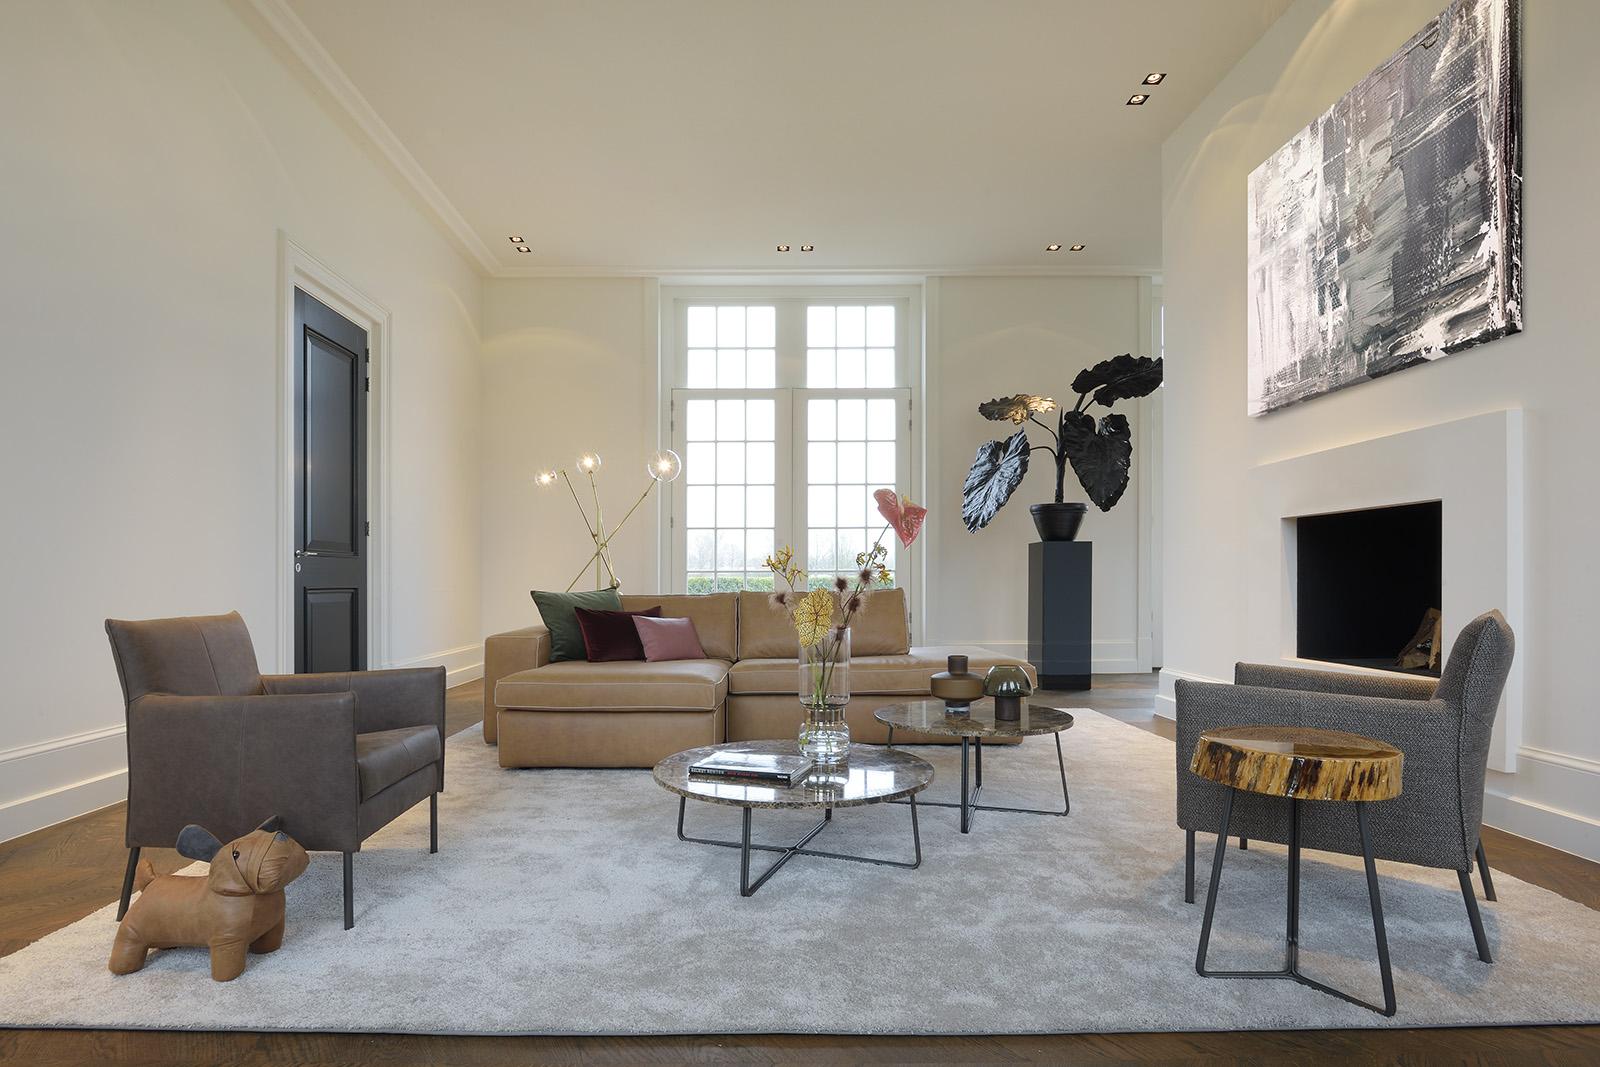 Bert Plantagie Brown woonkamer met Xenna Bank Dalia stoel en Trunk tafel